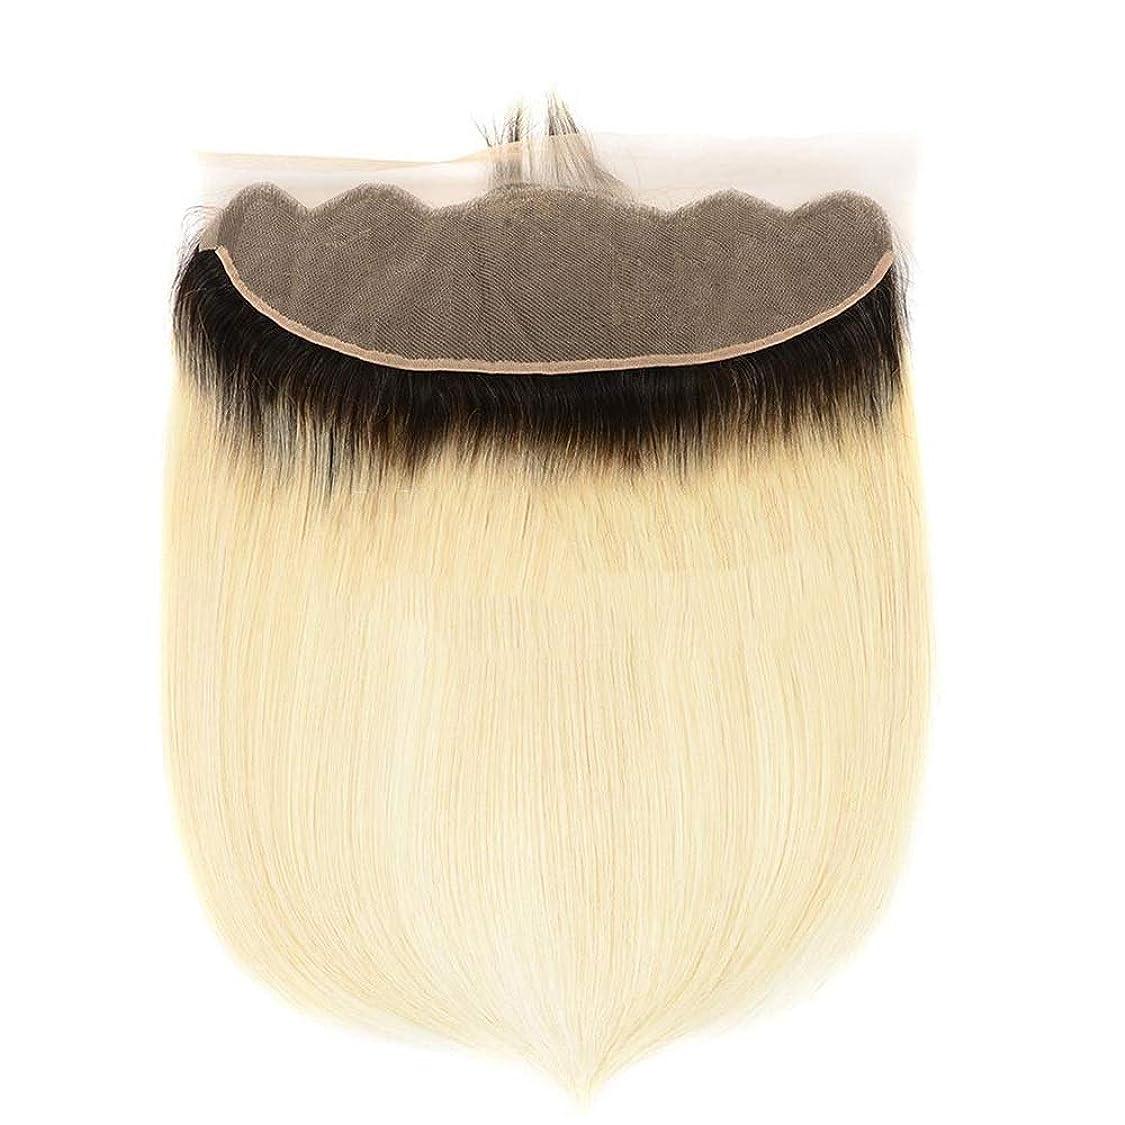 BOBIDYEE 1B / 613#金髪絹のようなストレートヘアー部分13x4レースの前頭9Aブラジルの人間の髪の毛(8インチ-20インチ)合成髪レースかつらロールプレイングウィッグロング&ショート女性自然 (色 : Blonde, サイズ : 12 inch)